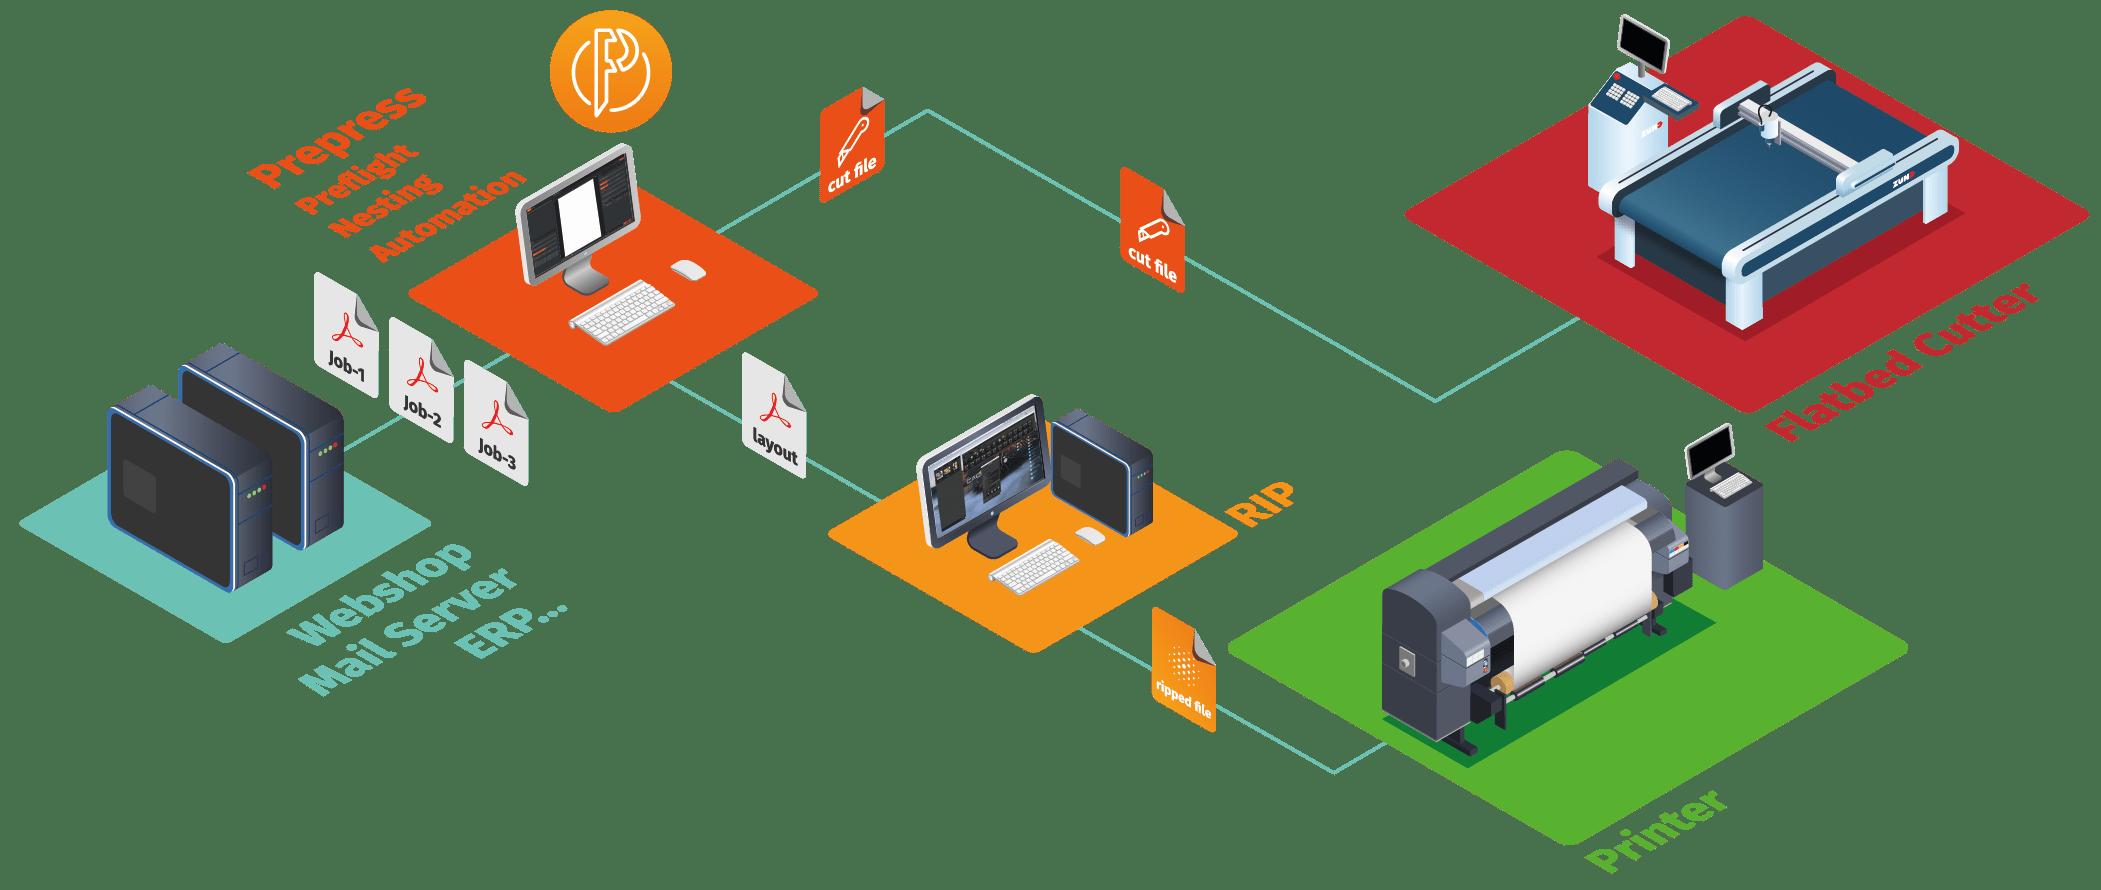 Caldera PrimeCenter Workflow